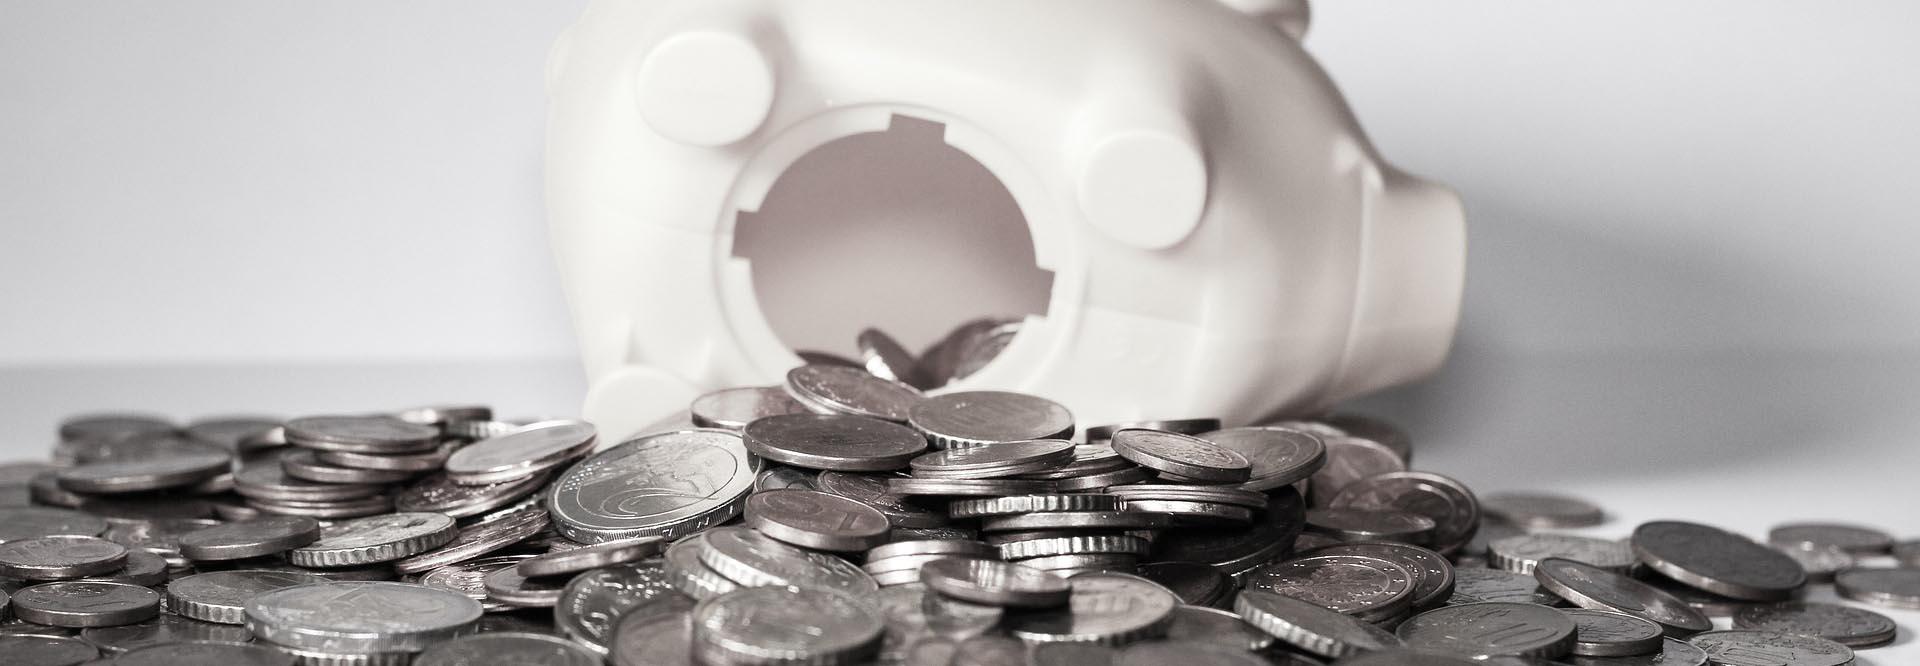 Cover 2 บทความ วิธีการออมเงิน